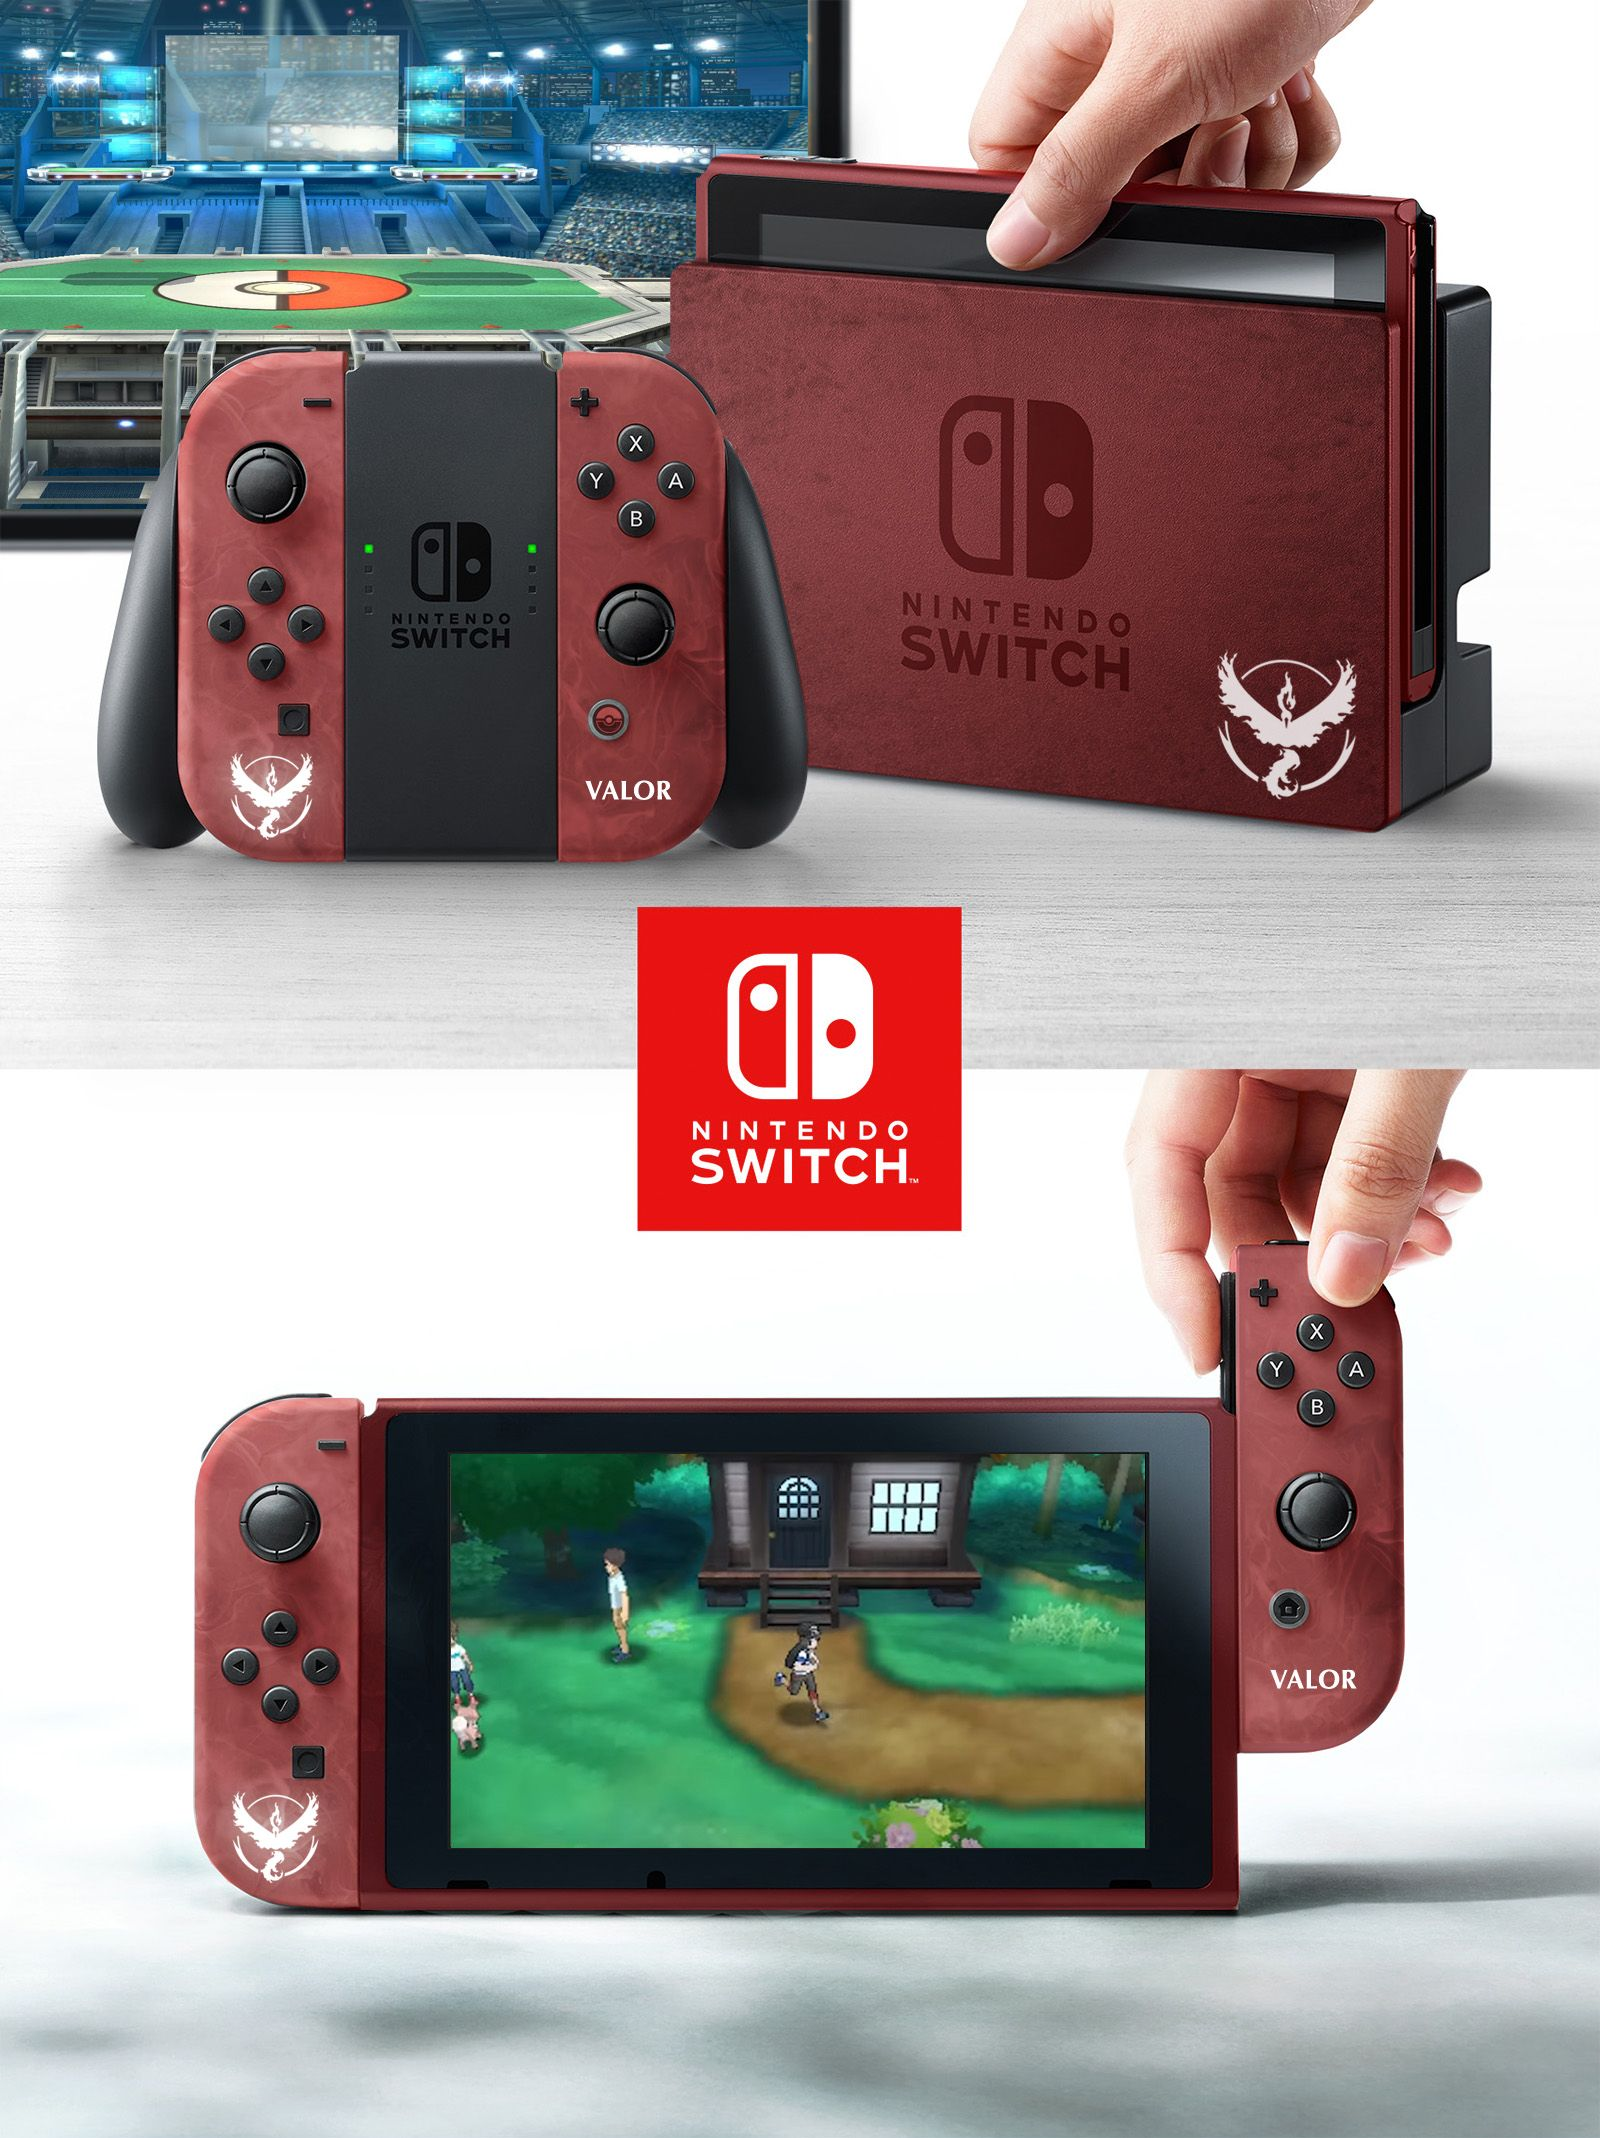 I Made A Skin Design For The Nintendo Switch For All 3 Teams Nintendo Switch Accessories Nintendo Nintendo Switch Games